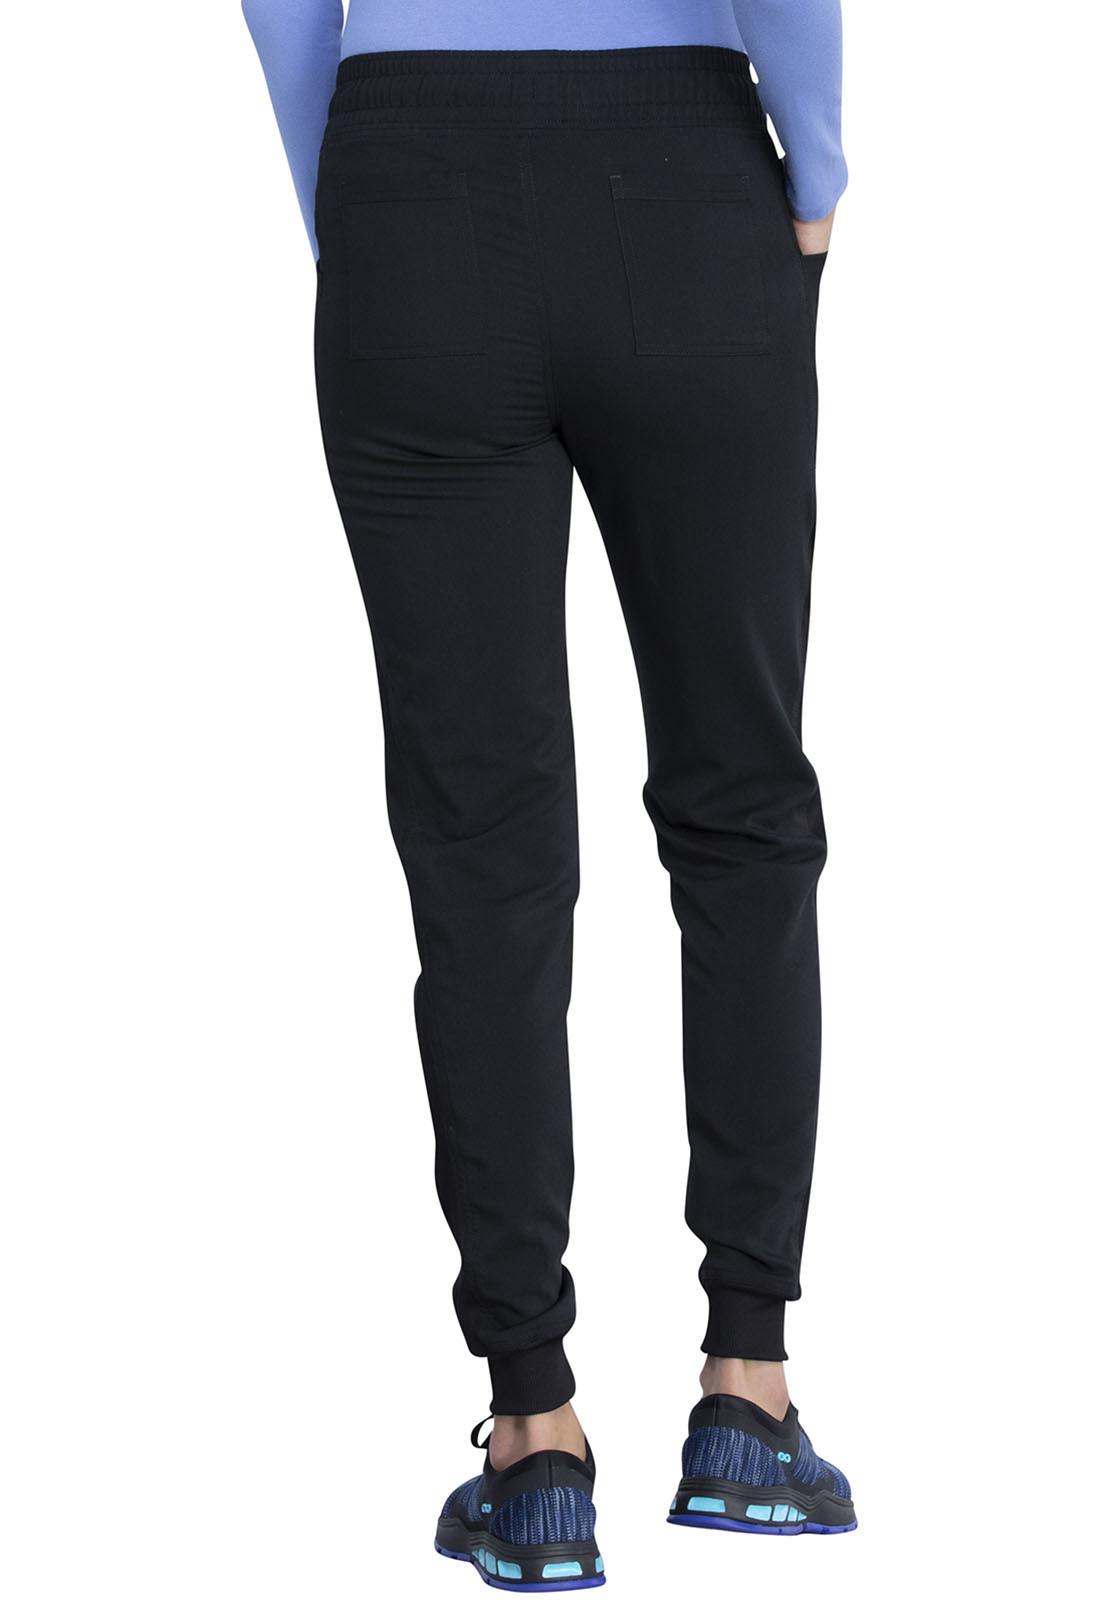 CHEROKEE Mid Rise Jogger Pants Black DK155